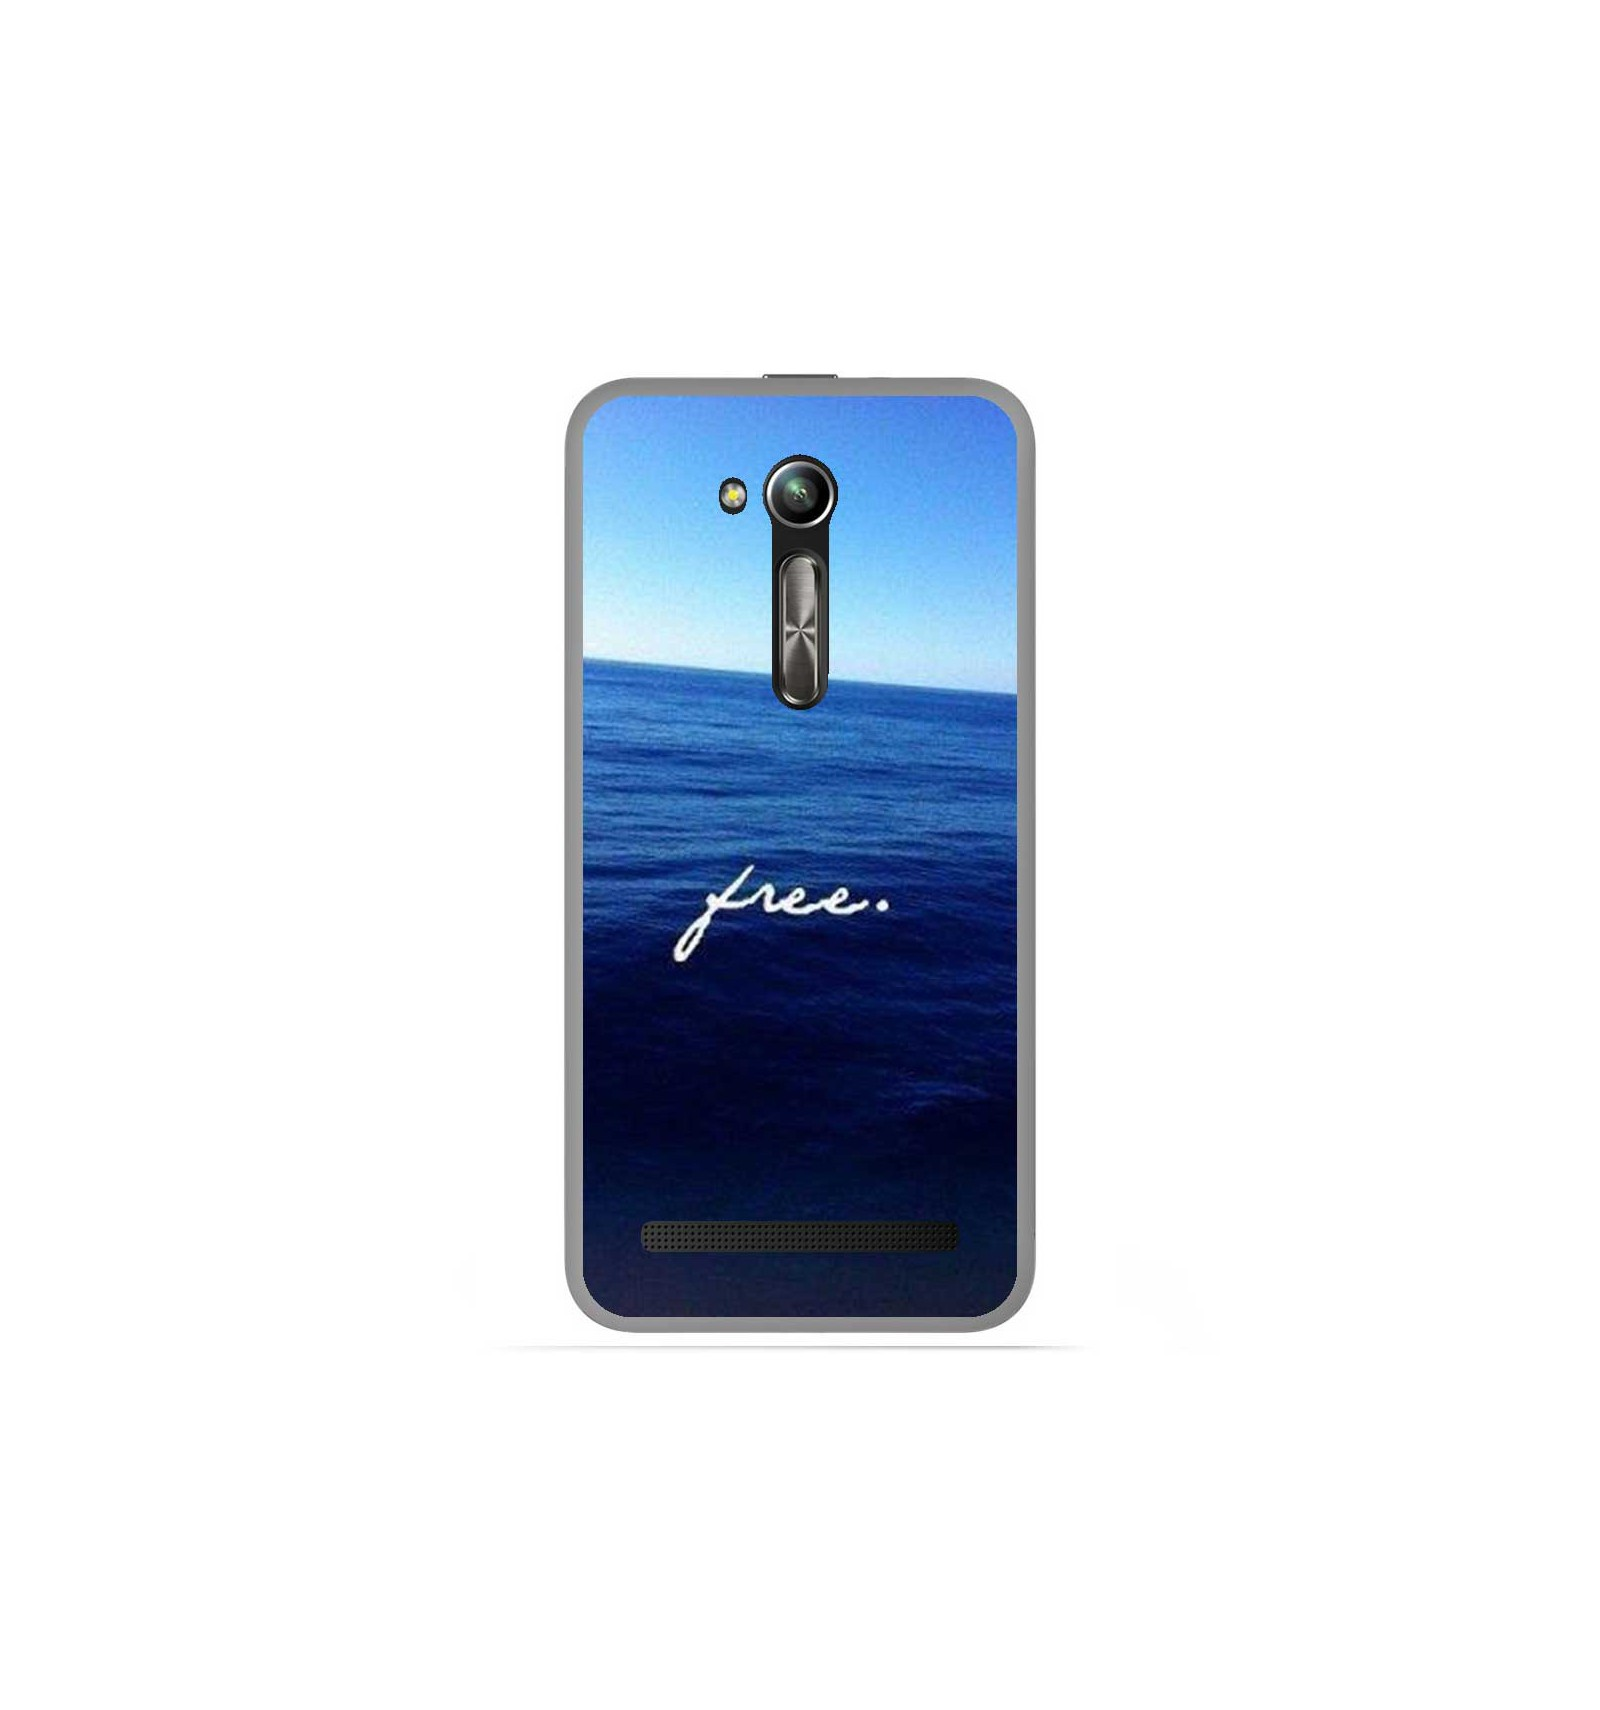 Coque En Silicone Asus Zenfone Go Zb500kl Oc 233 An Free